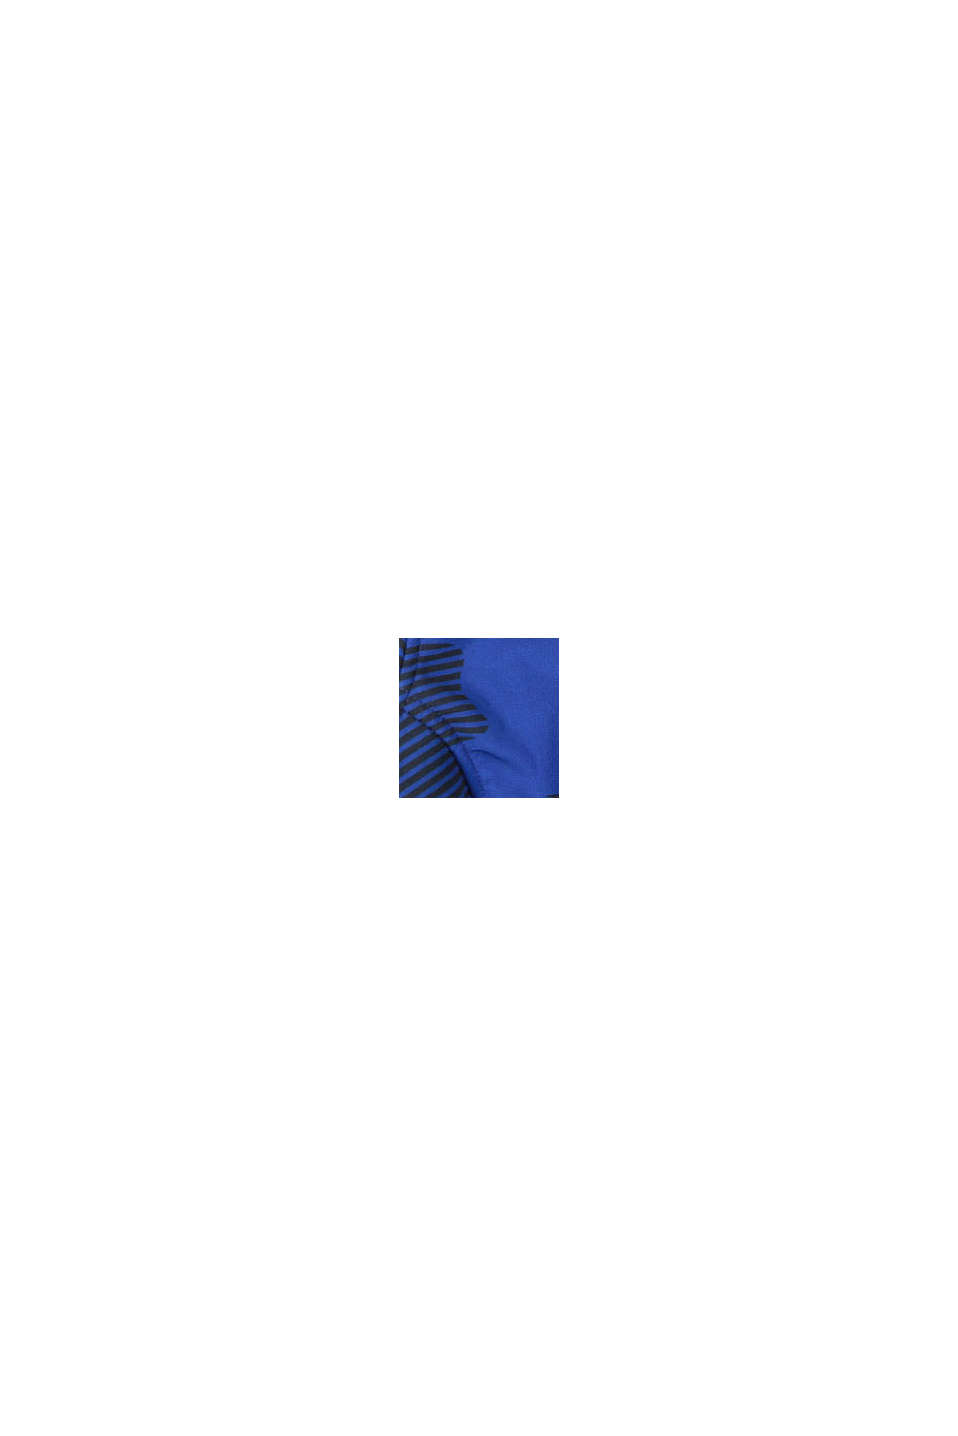 Softshell jas met print, BRIGHT BLUE, swatch